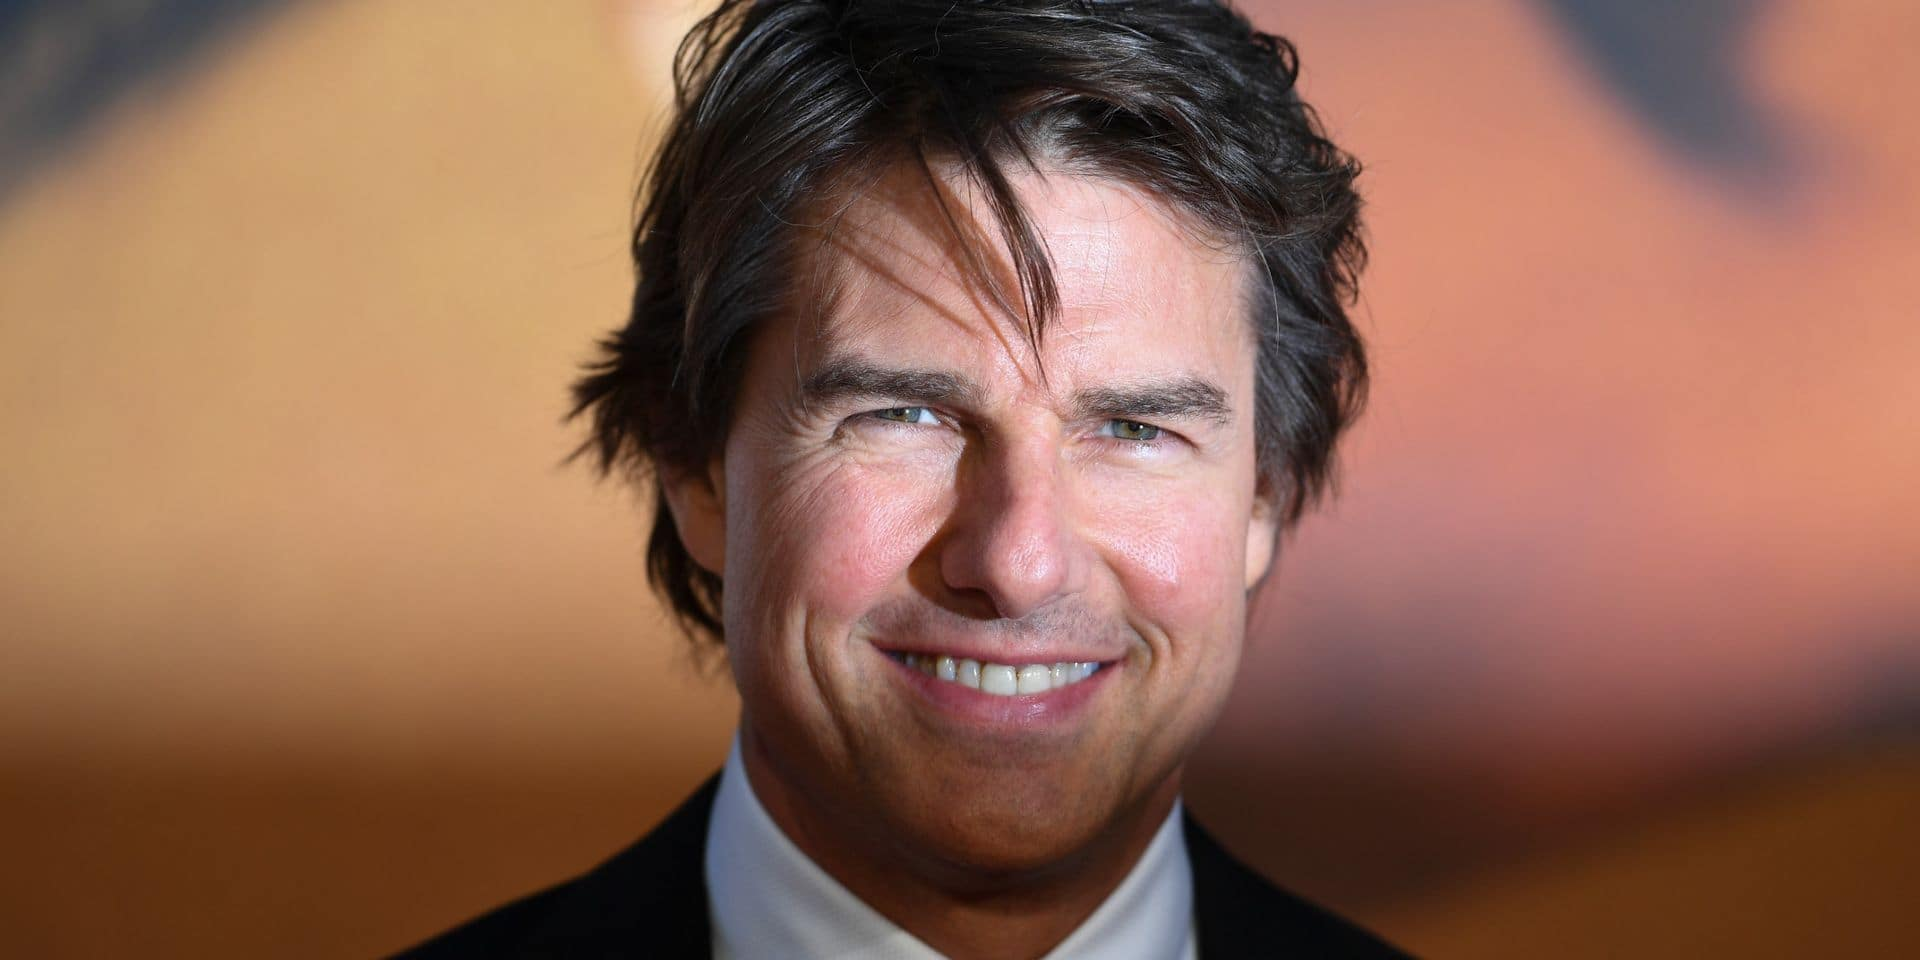 Tom Cruise : sa nouvelle cascade épique bluffe encore les internautes